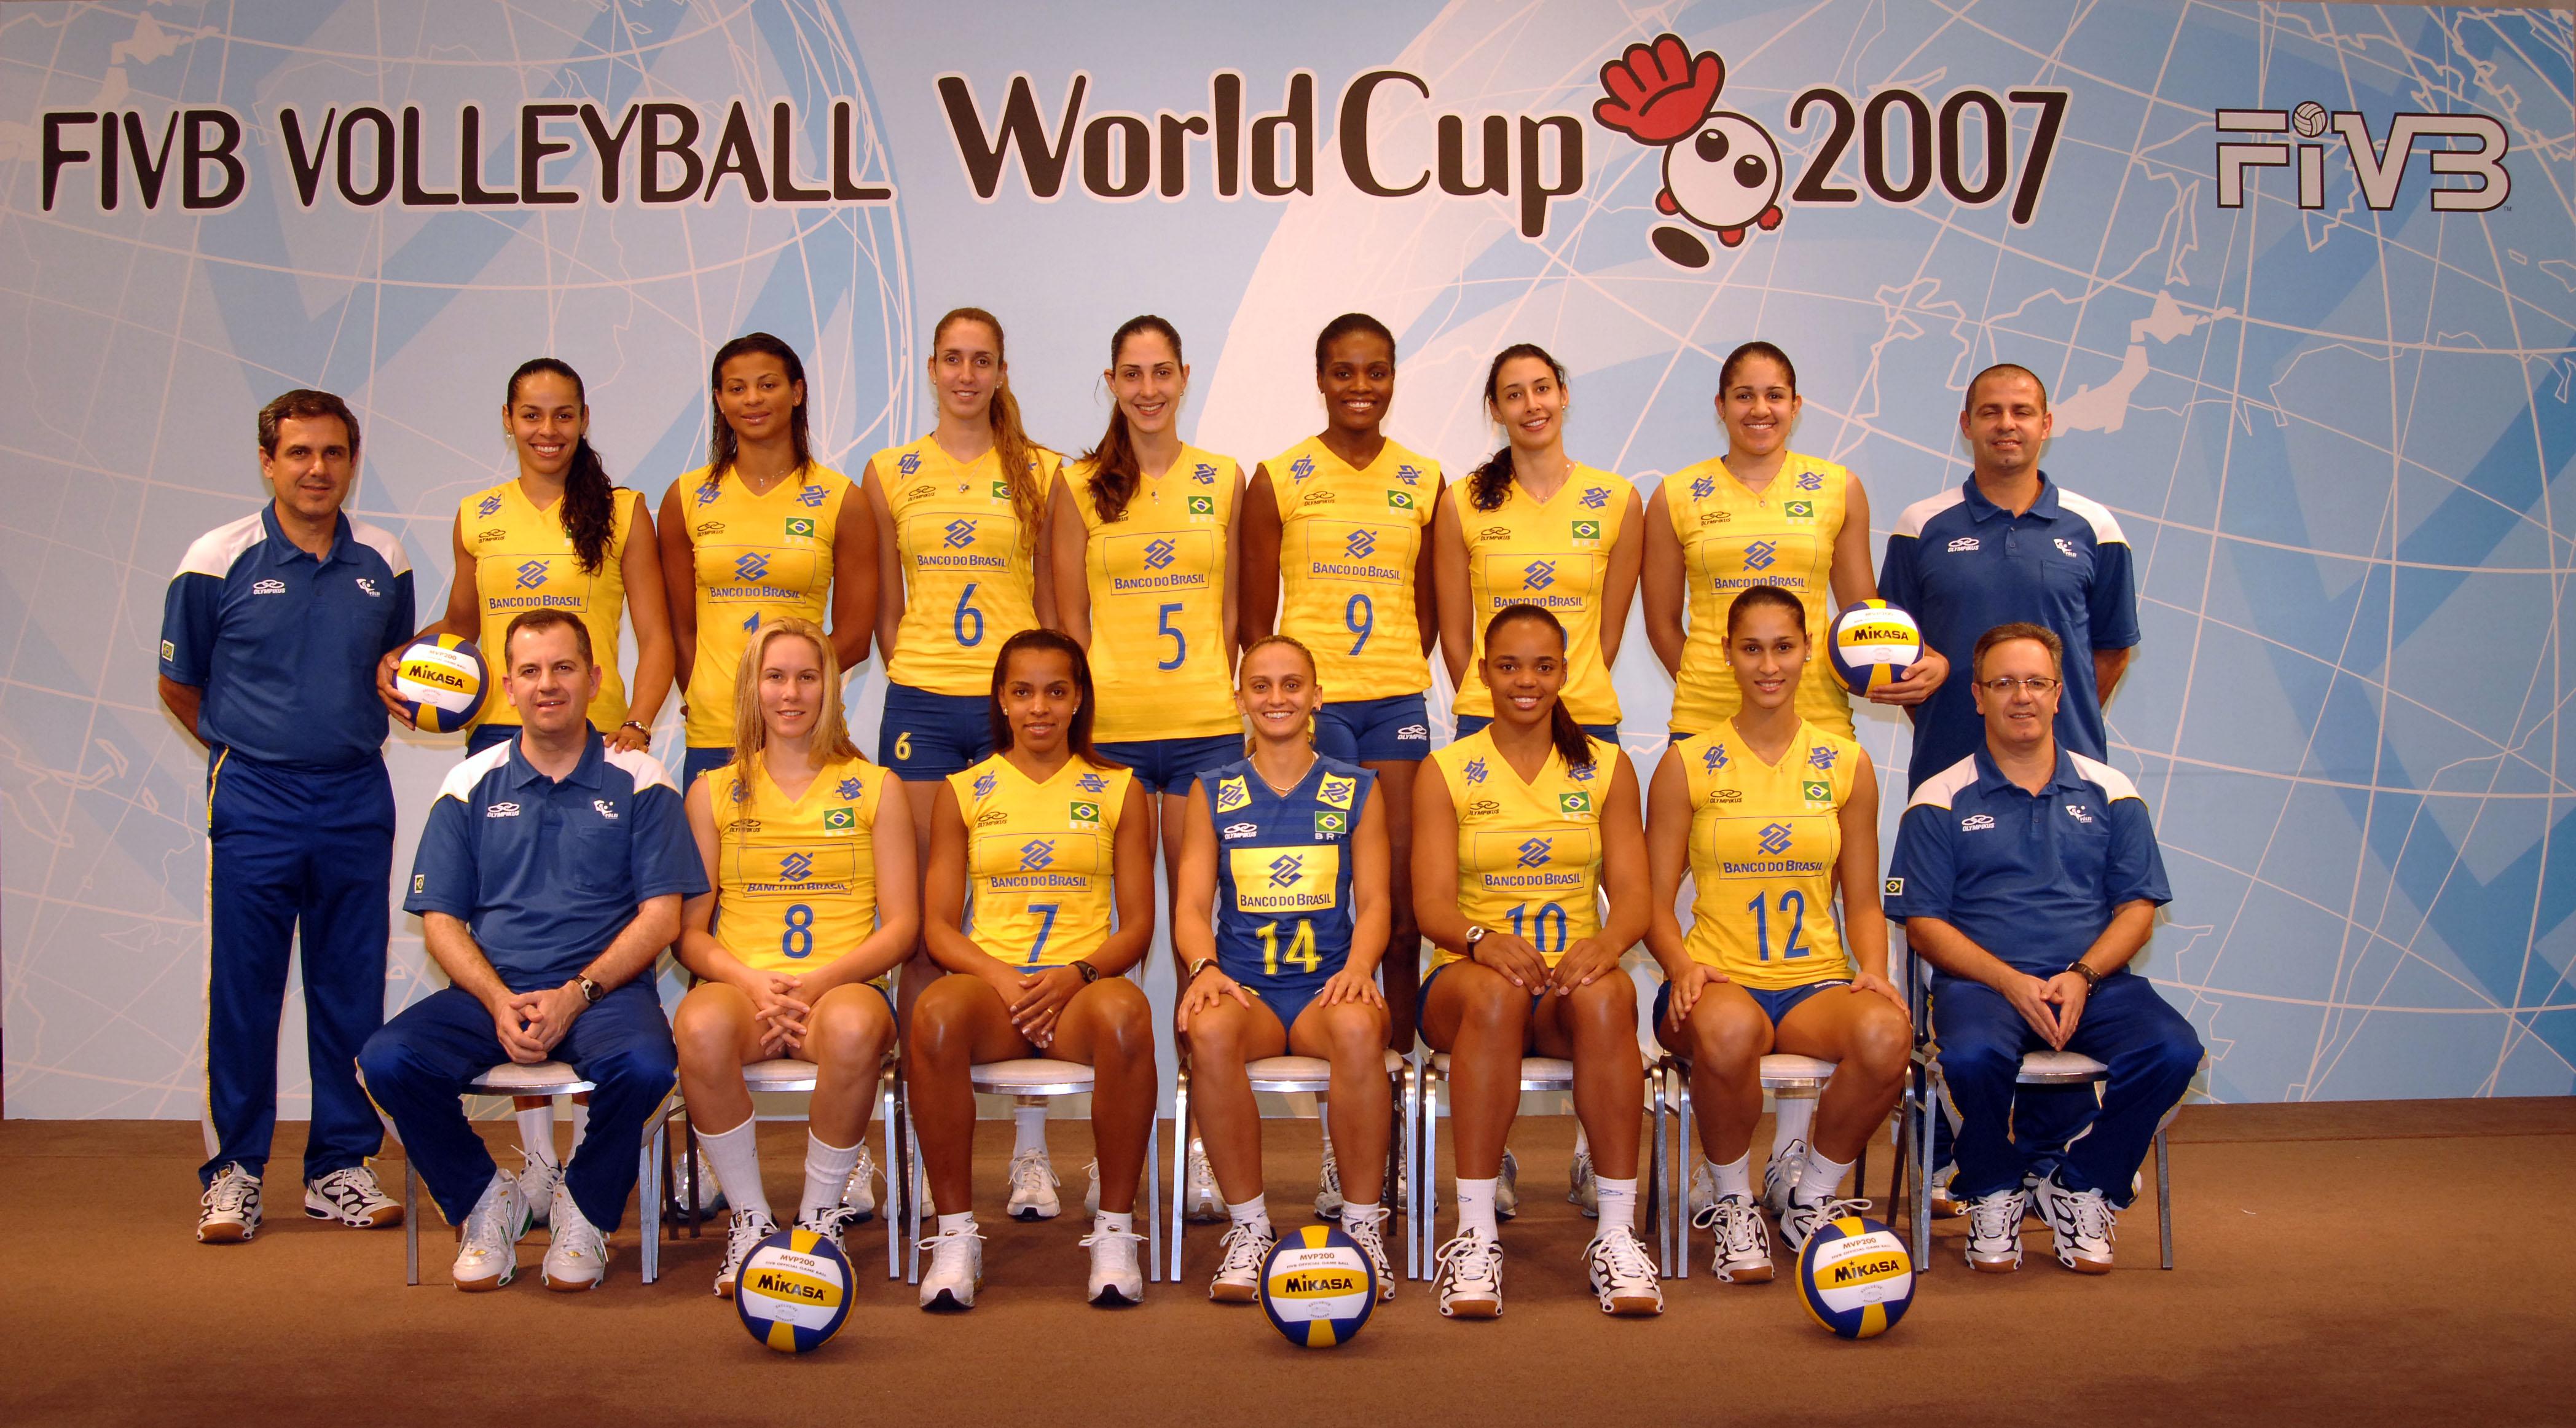 2007 Women S World Cup Team Roster Bra